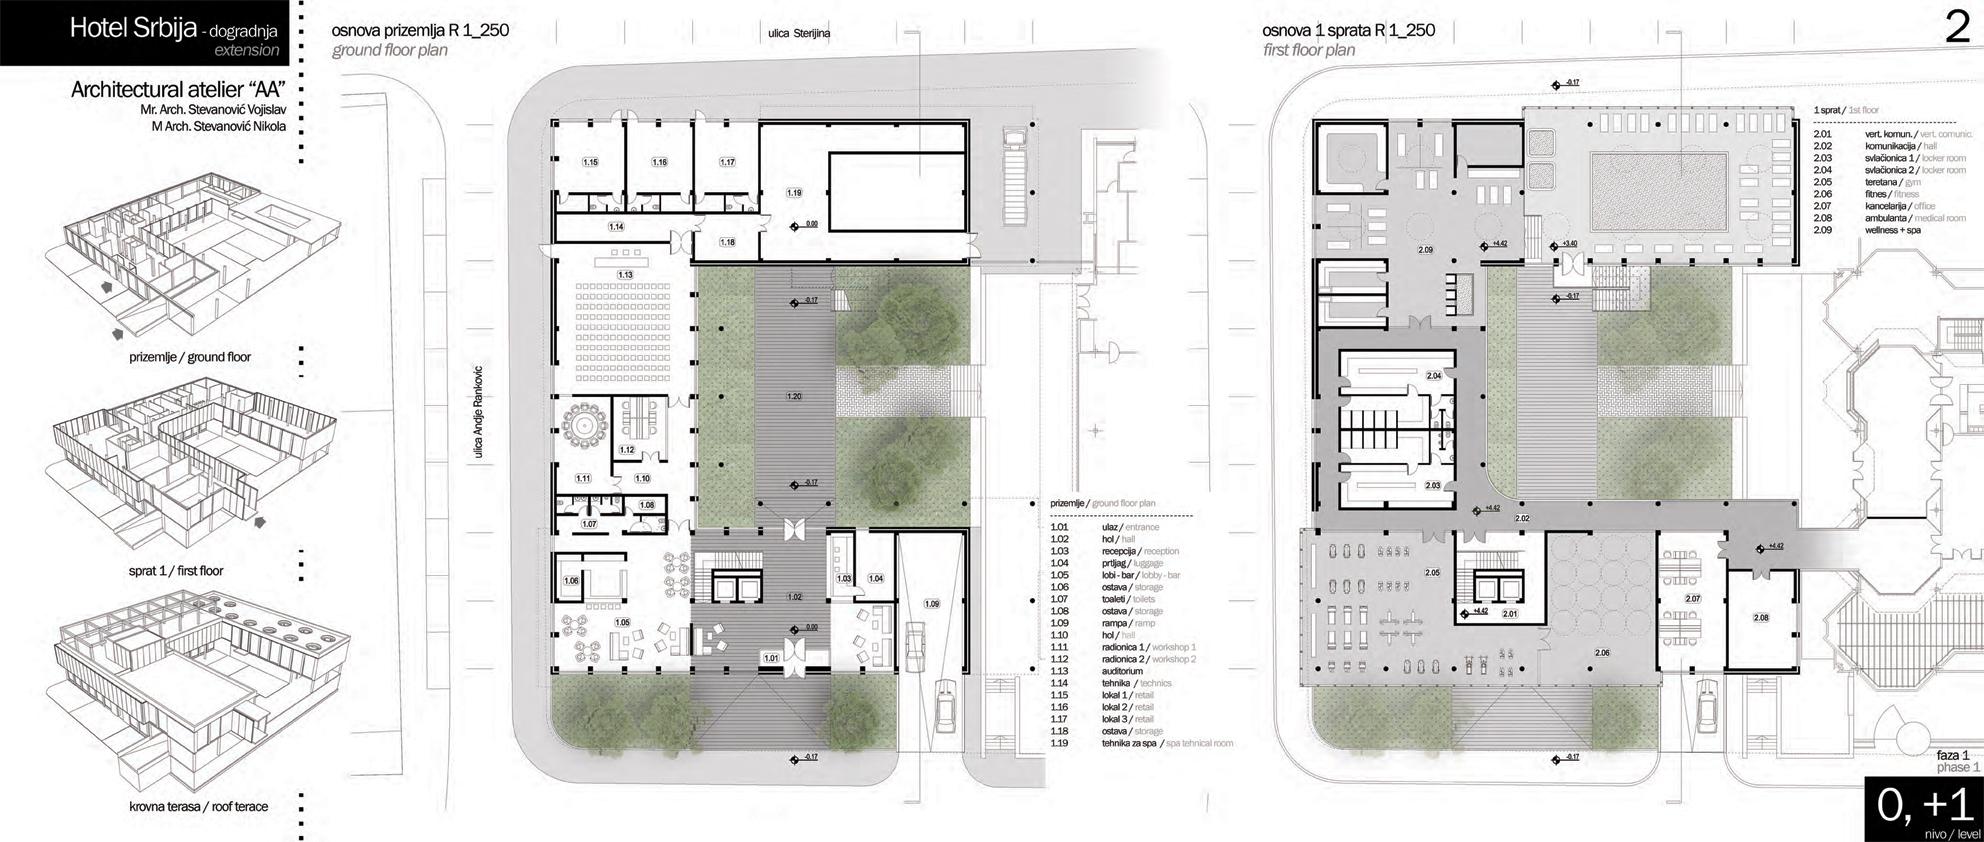 competition-hotel-srbija-extension-vrsac_aa-4